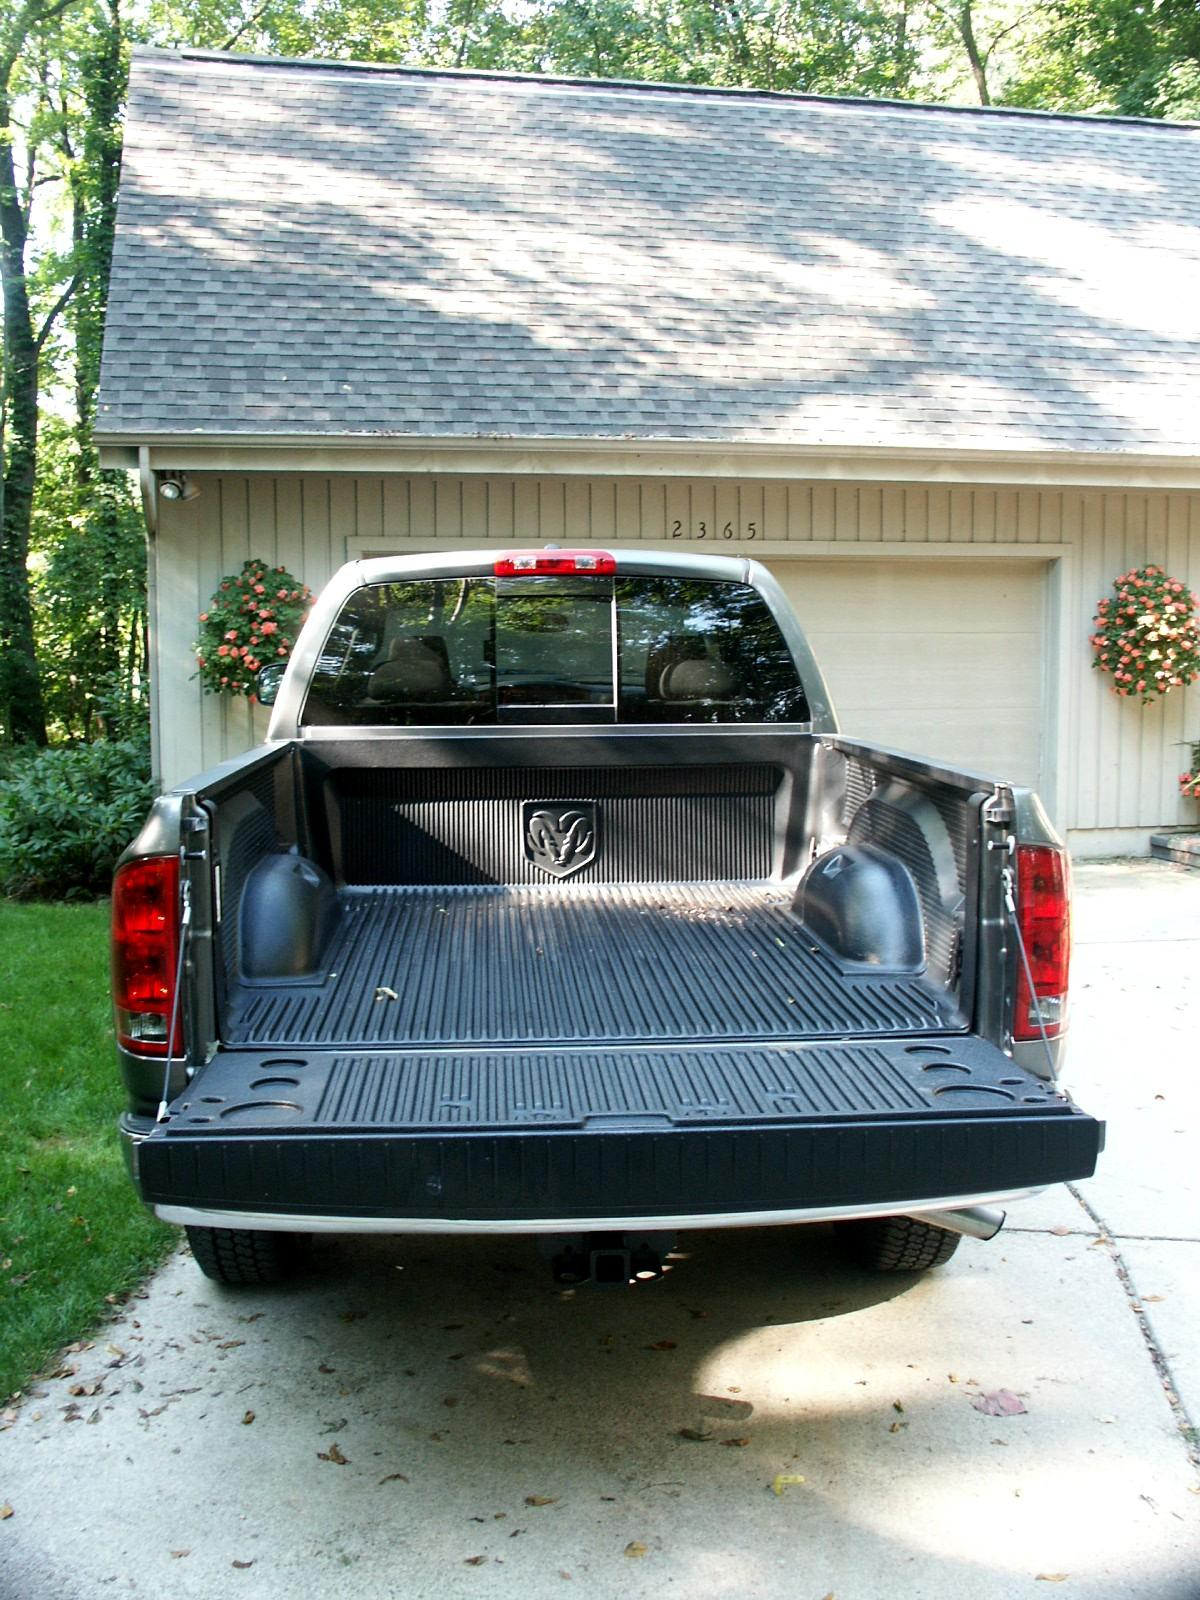 dodge ram 1500 slt quad cab 4x4 picture 5 reviews news specs buy car. Black Bedroom Furniture Sets. Home Design Ideas